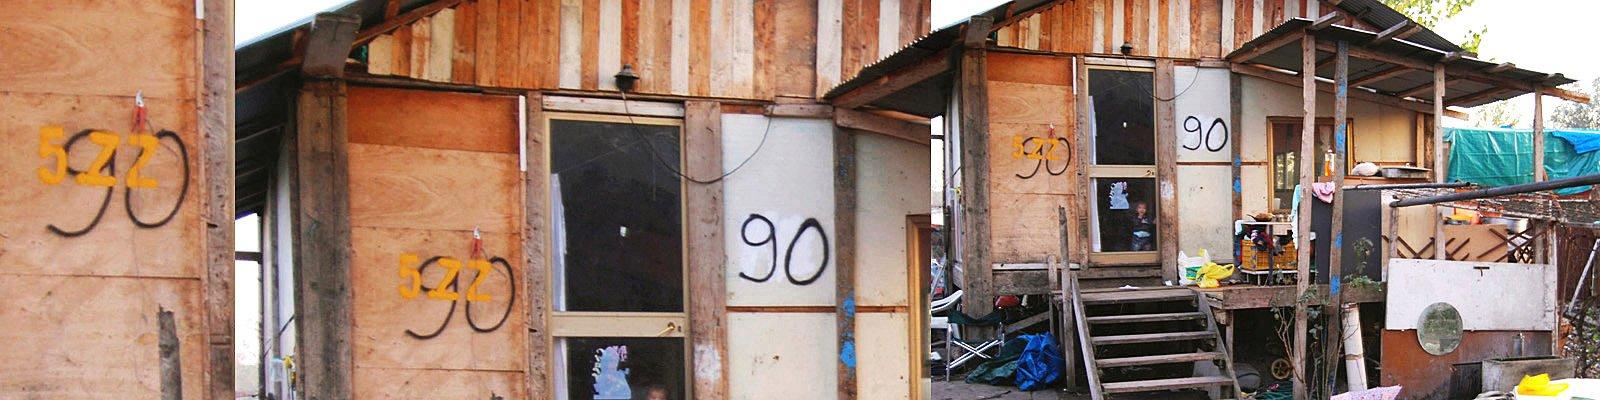 baracca rom